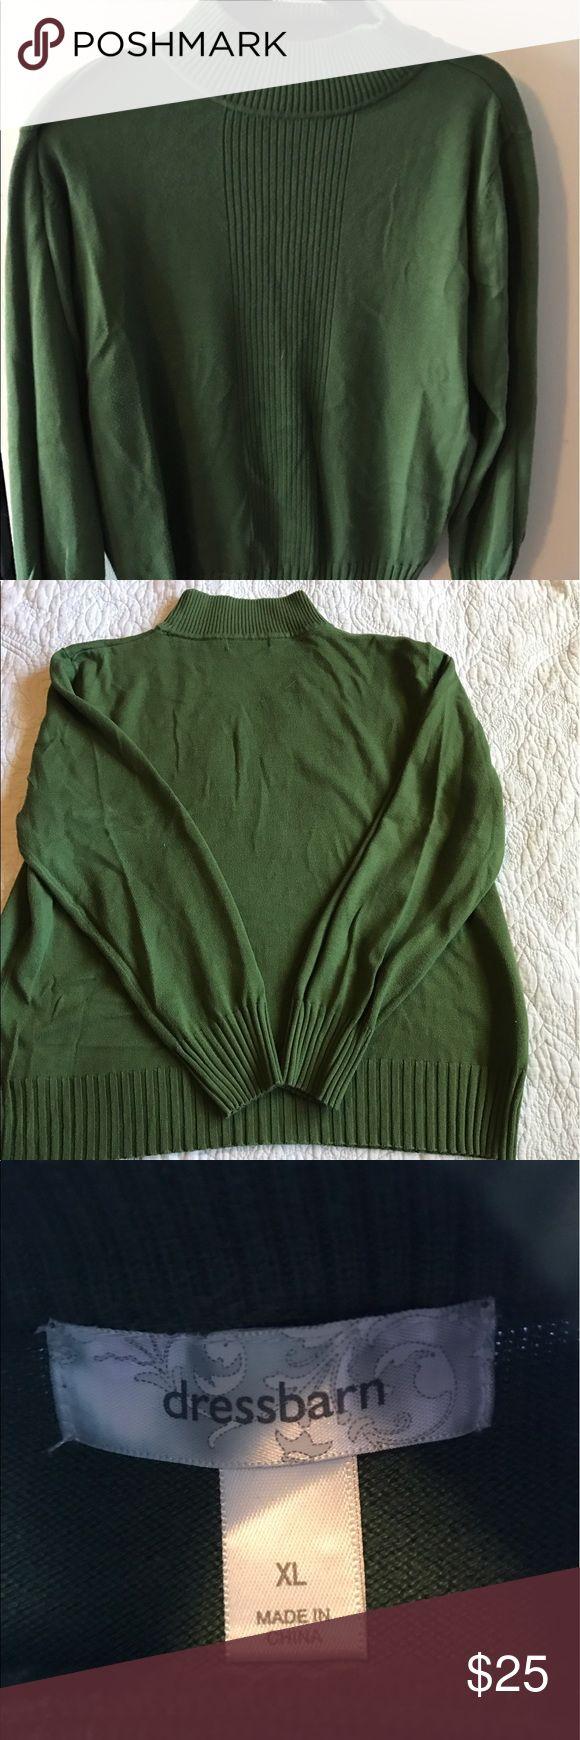 Dressbarn XL Green sweater Excellent condition Dressbarn XL Green mock turtleneck sweater Dress Barn Sweaters Cowl & Turtlenecks